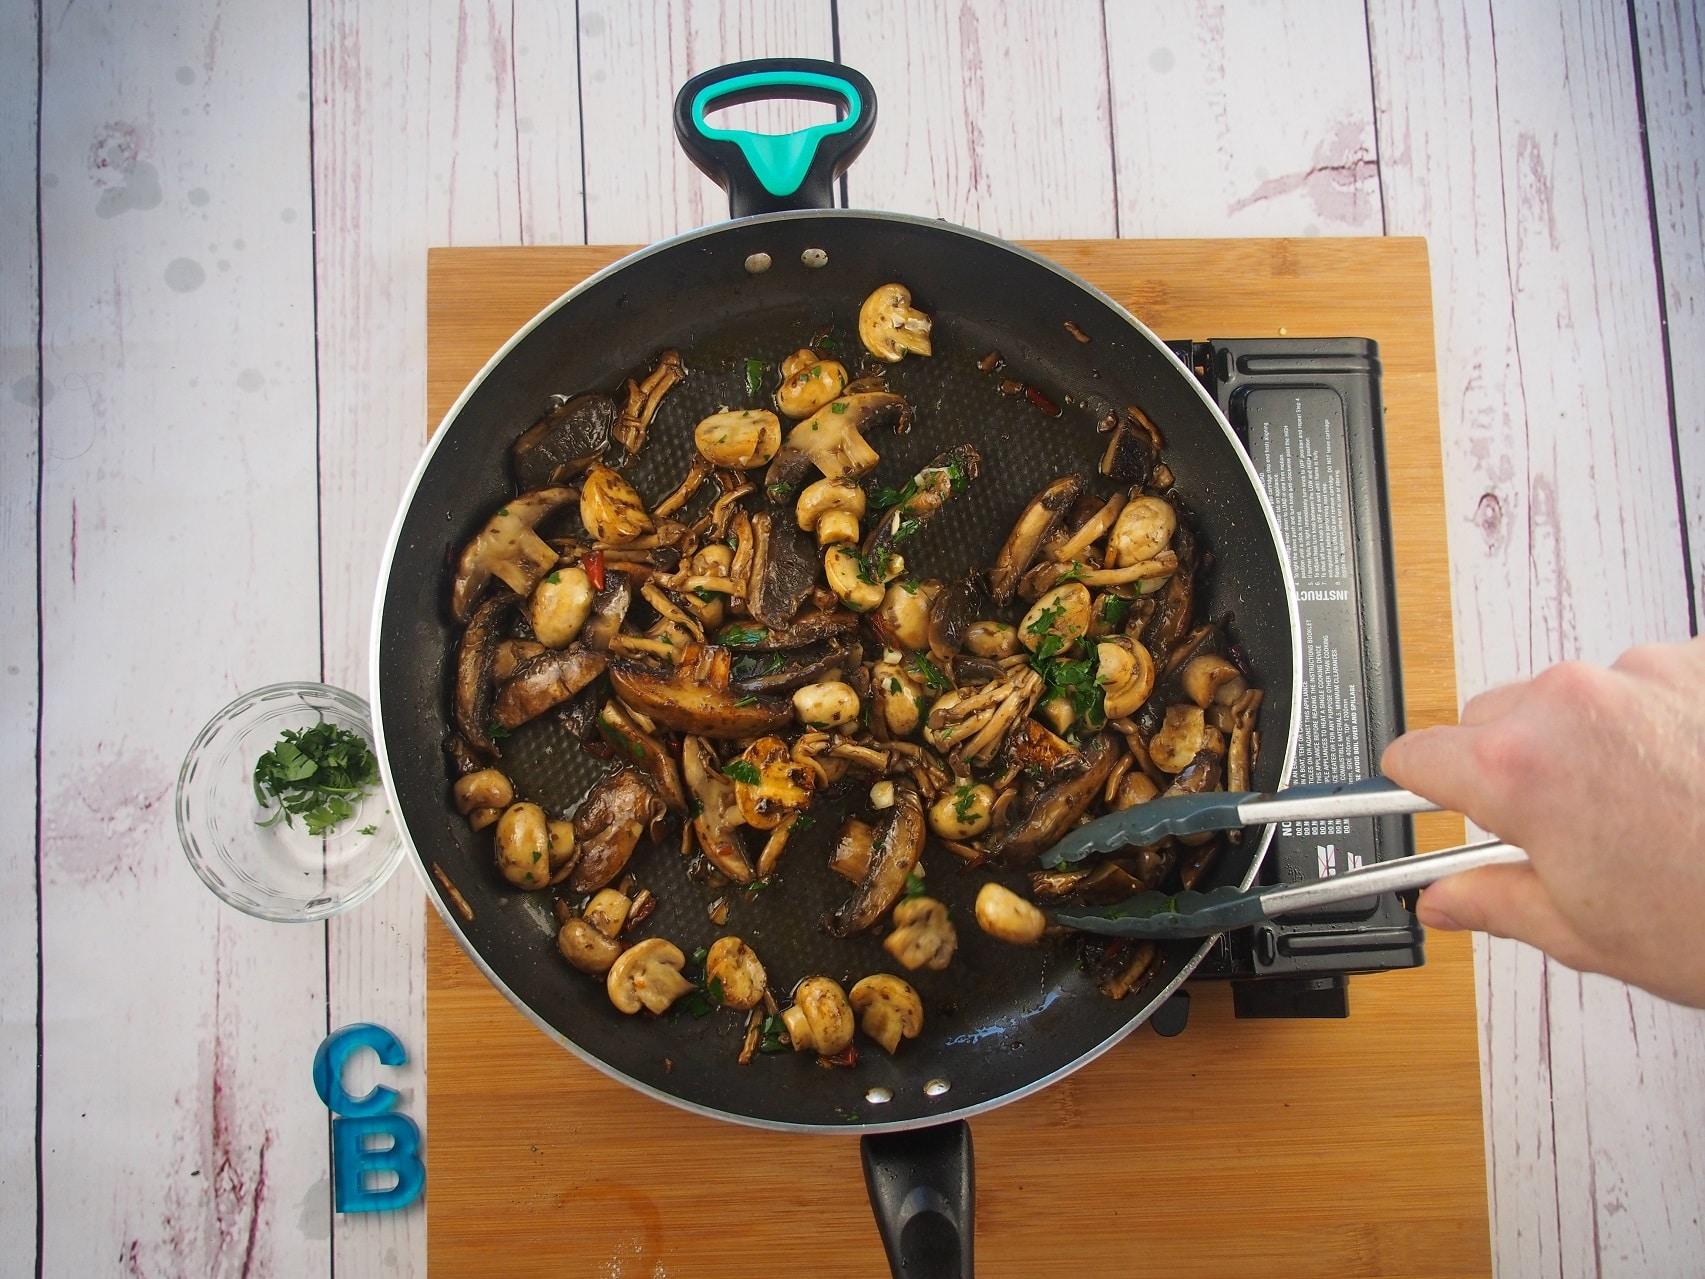 Cooking Blog - Vegan Garlic Mushrooms with Toast 7